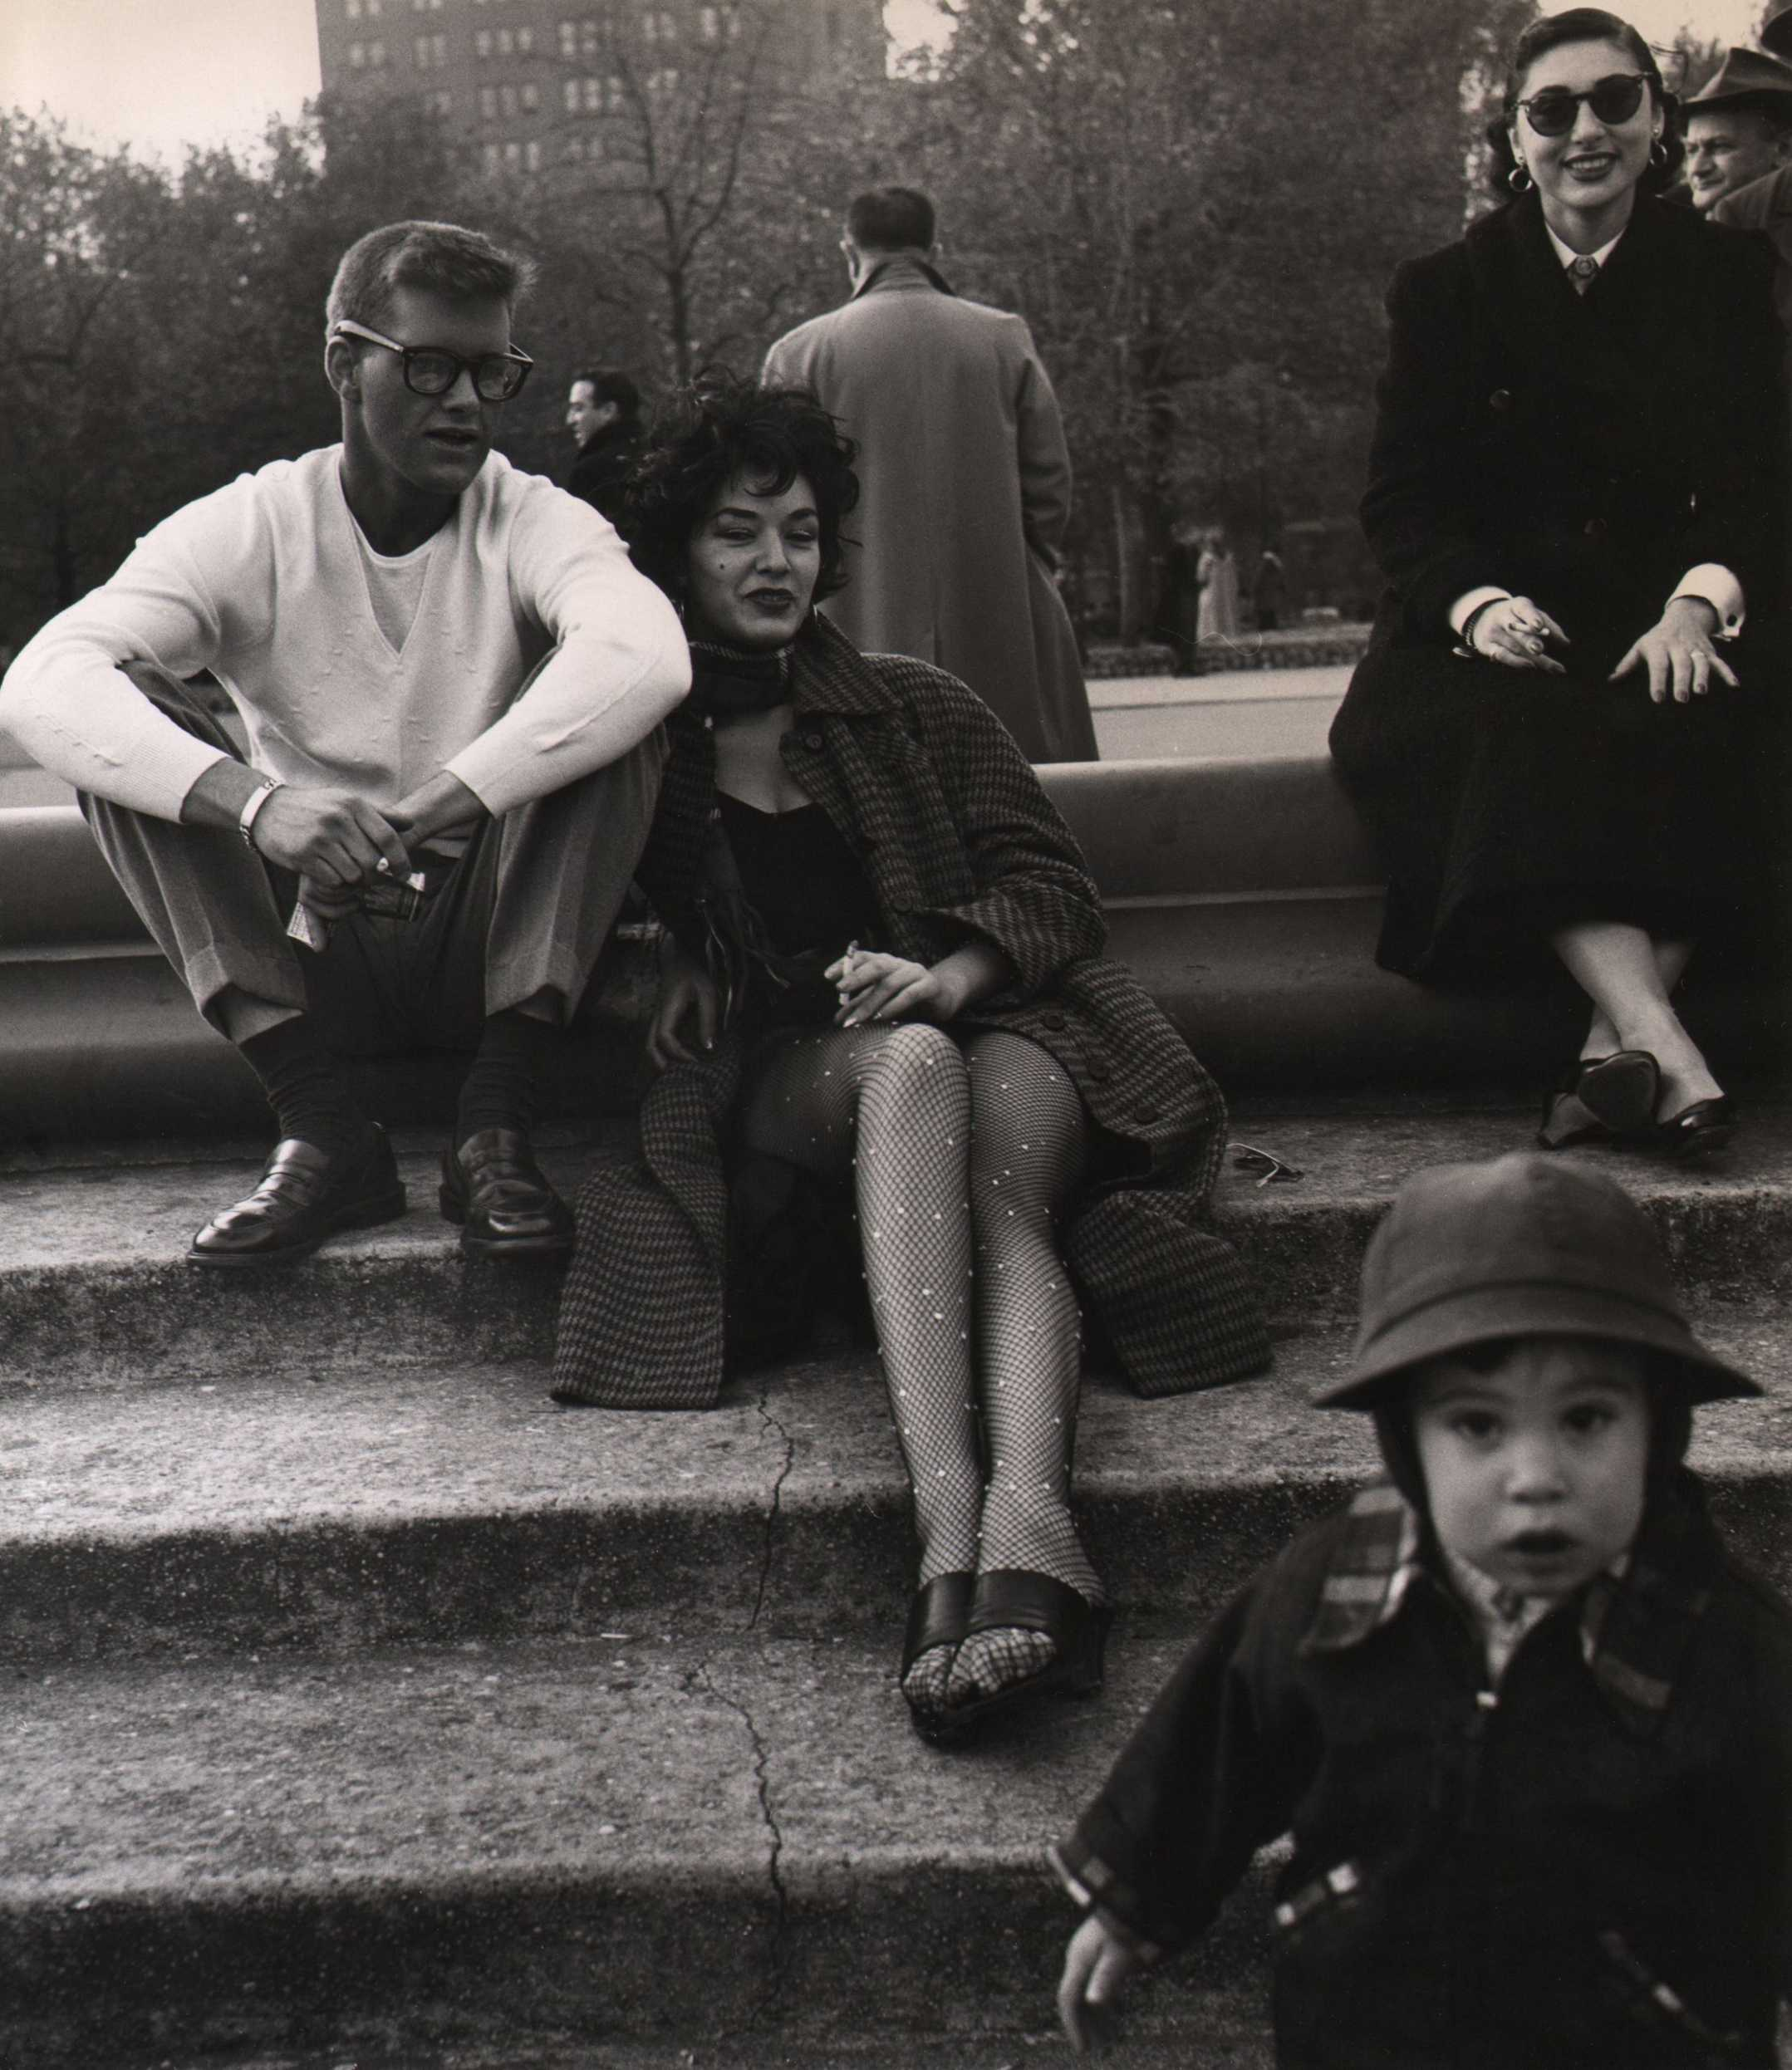 Weegee, Washington Square Park, c. 1955